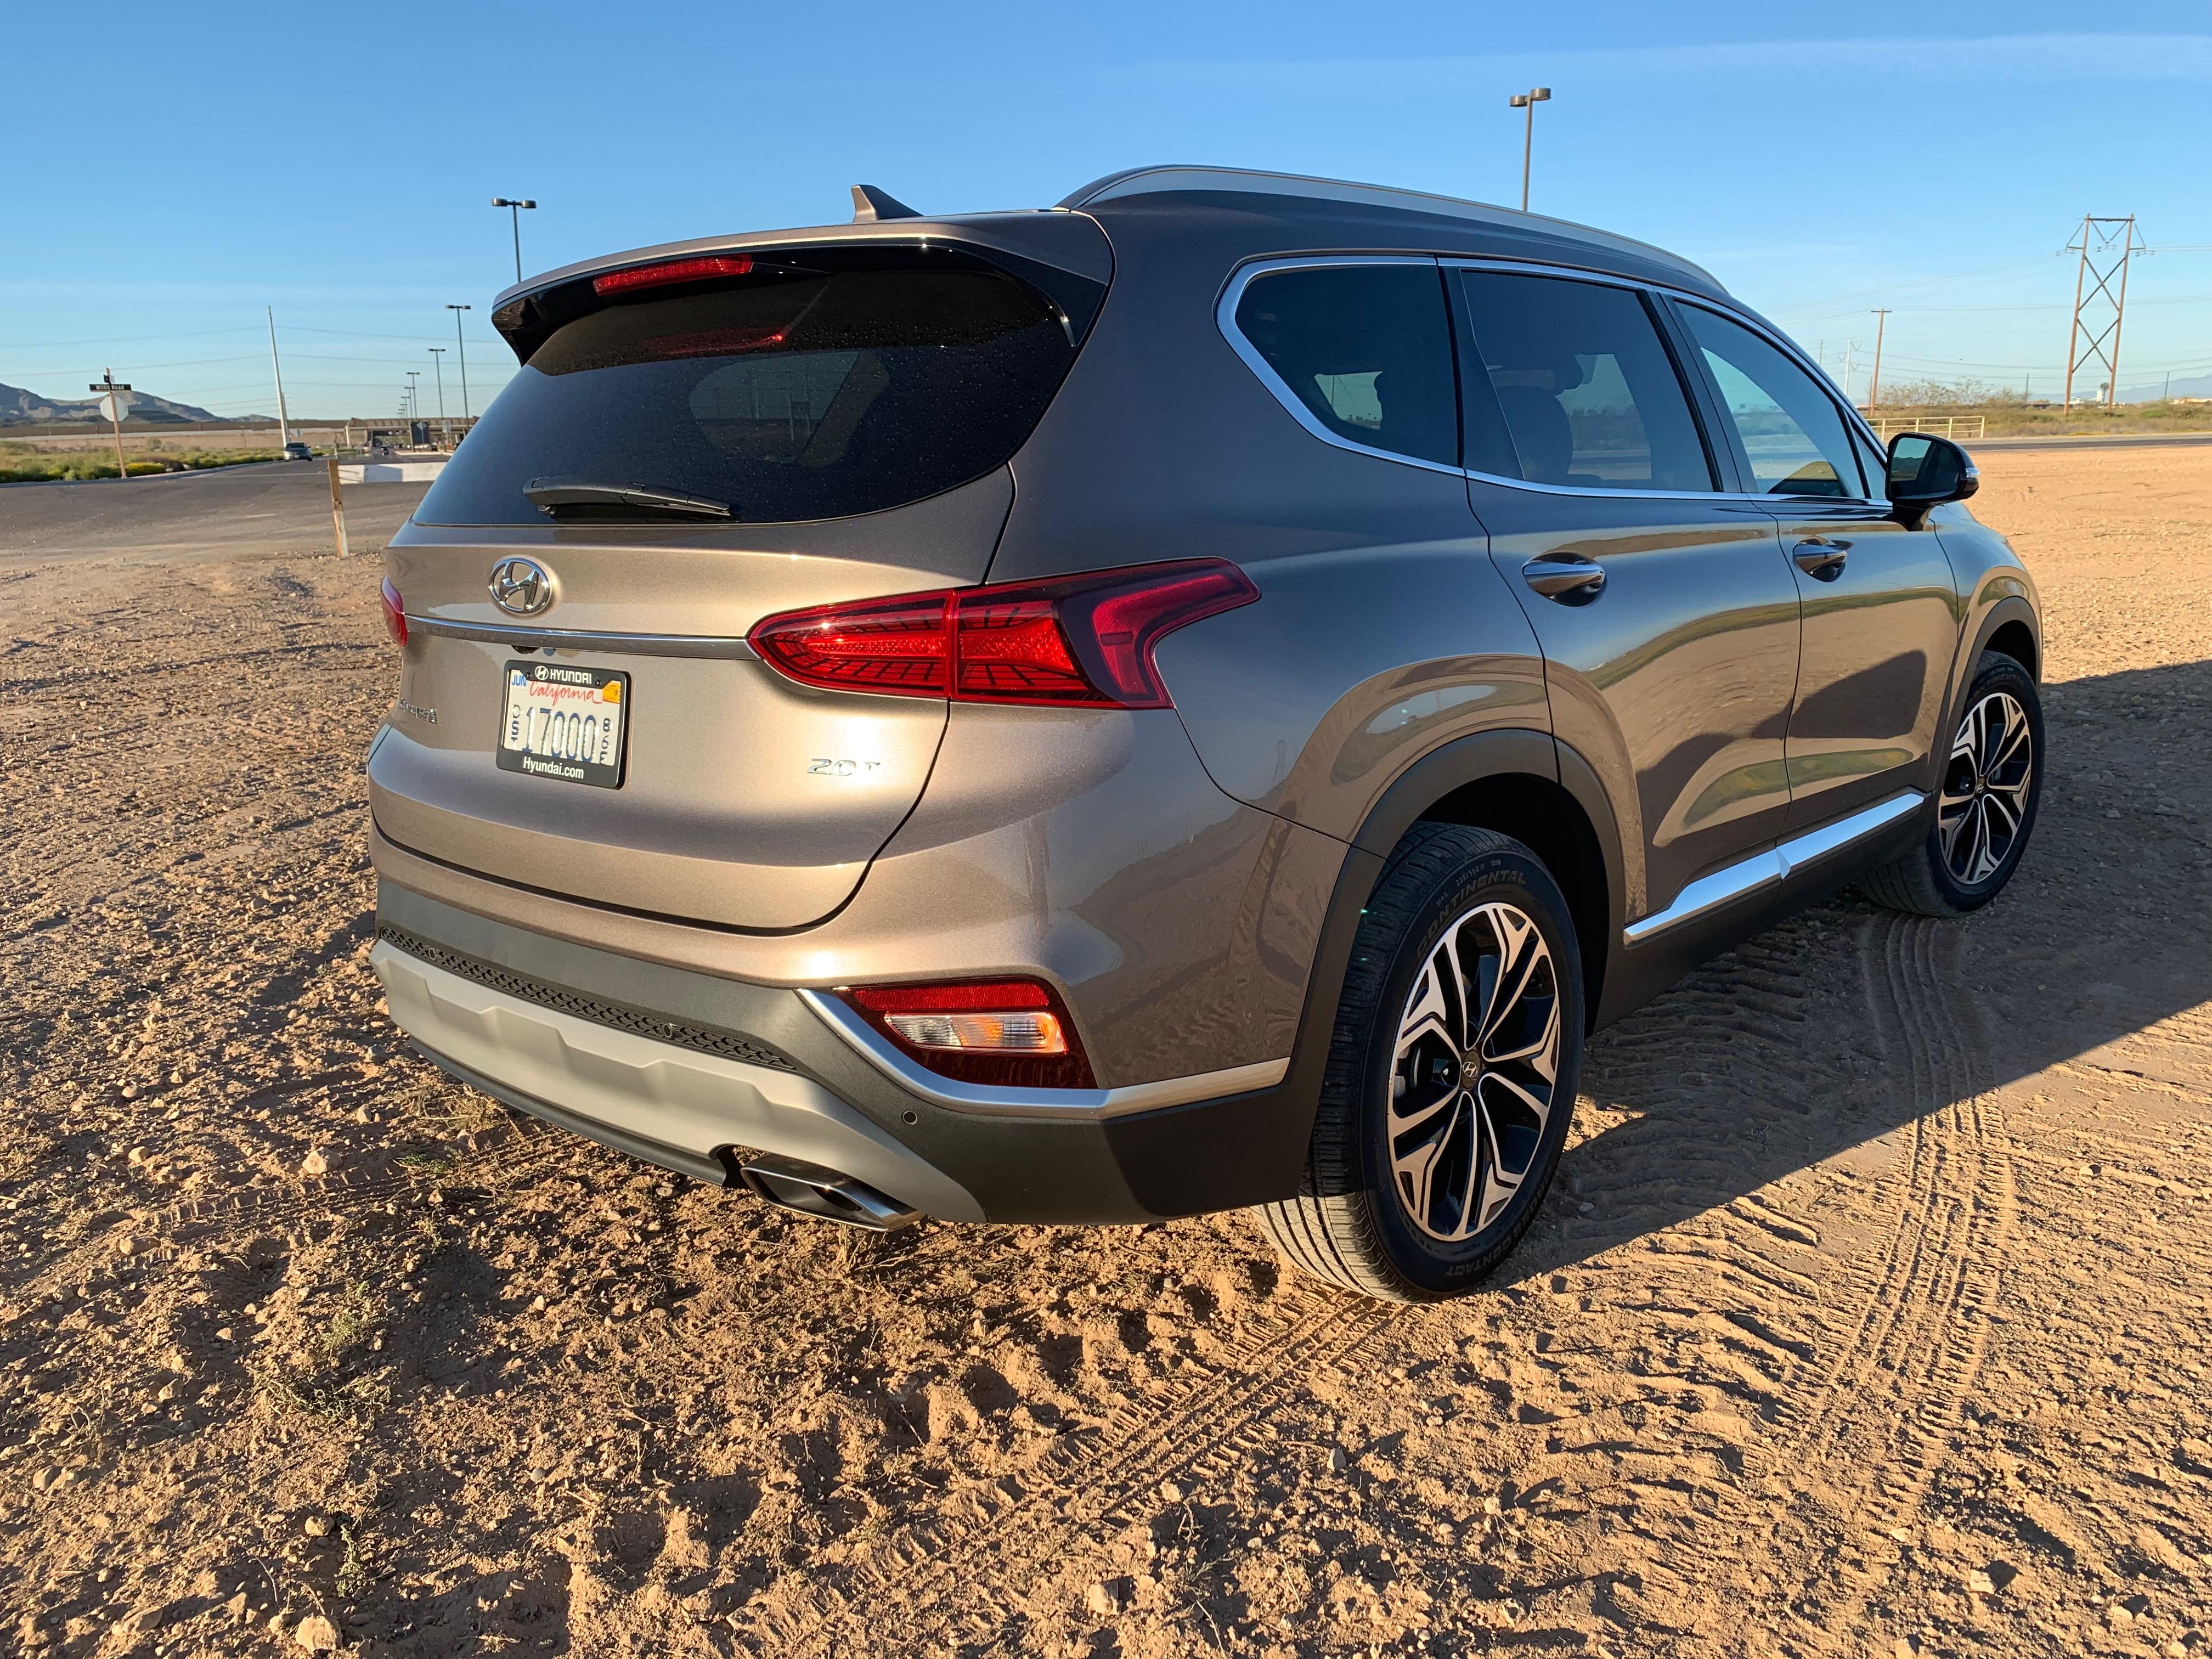 2019 Hyundai Santa Fe, Hyundai staking claim in mid-size crossover market with 2019 Santa Fe, ClassicCars.com Journal